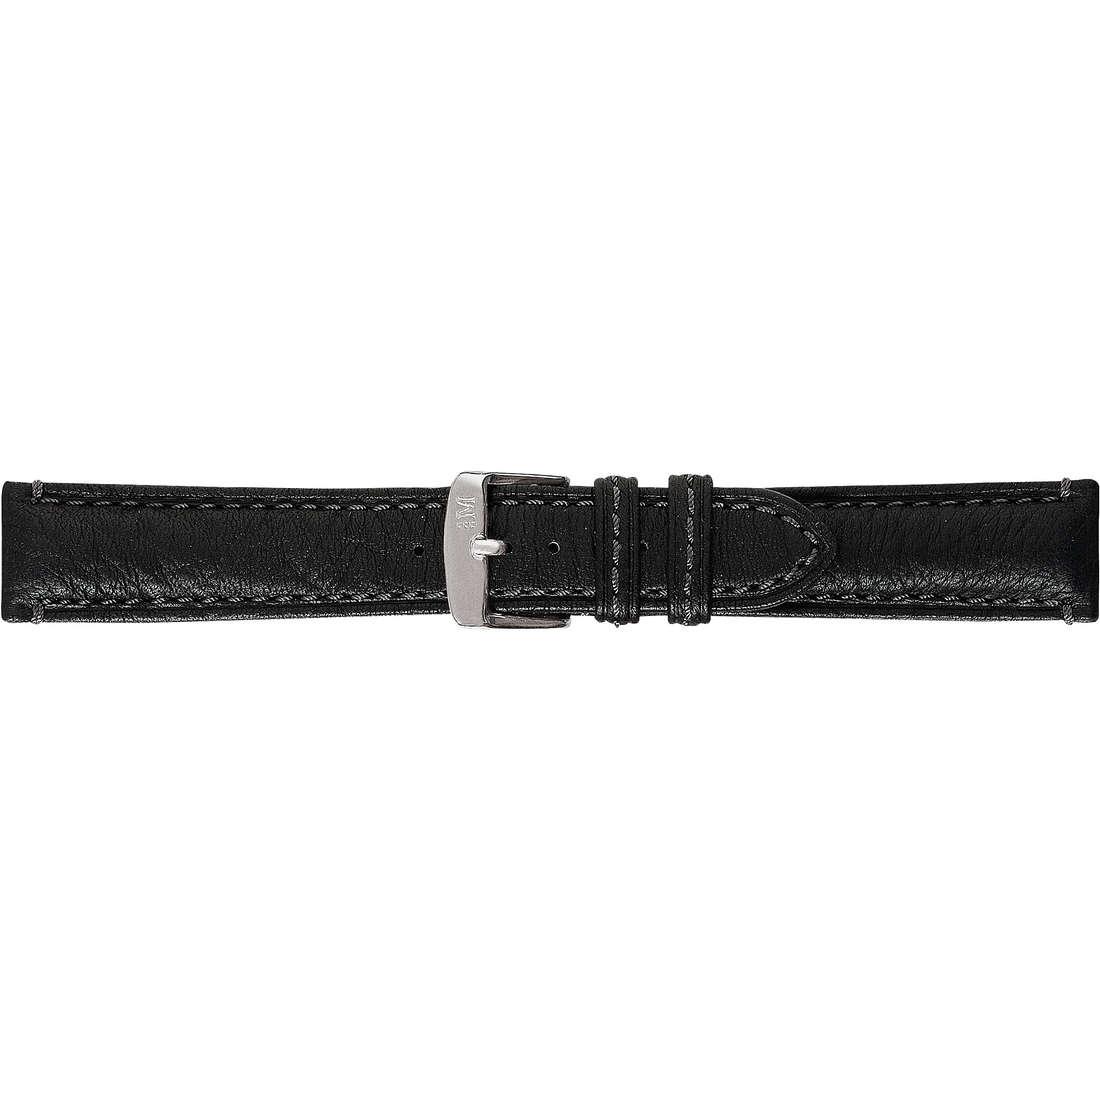 watch watch bands watch straps man Morellato Manufatti A01U3221767019CR20